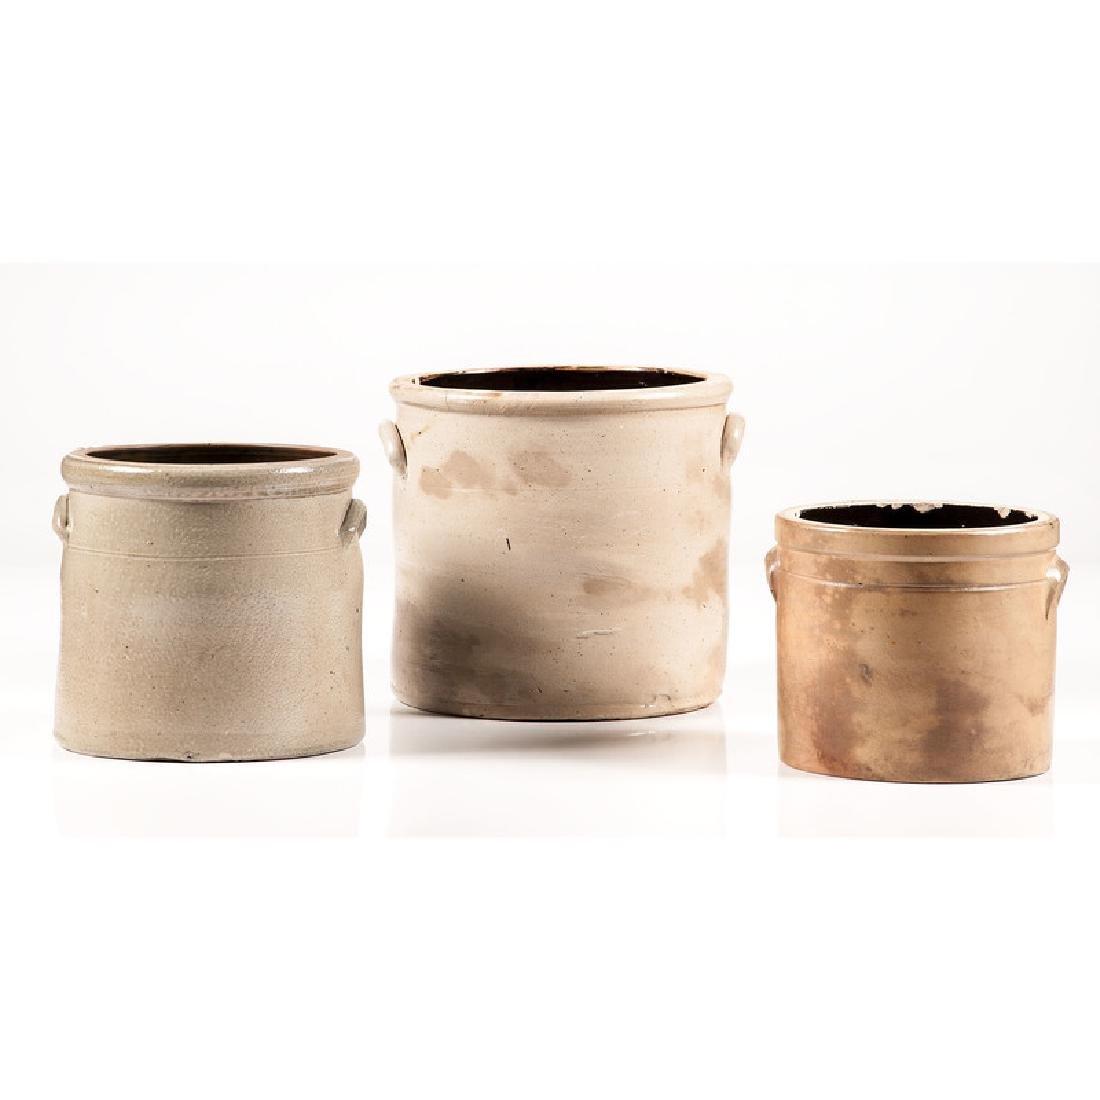 Stoneware Crocks with Bird Decoration - 3